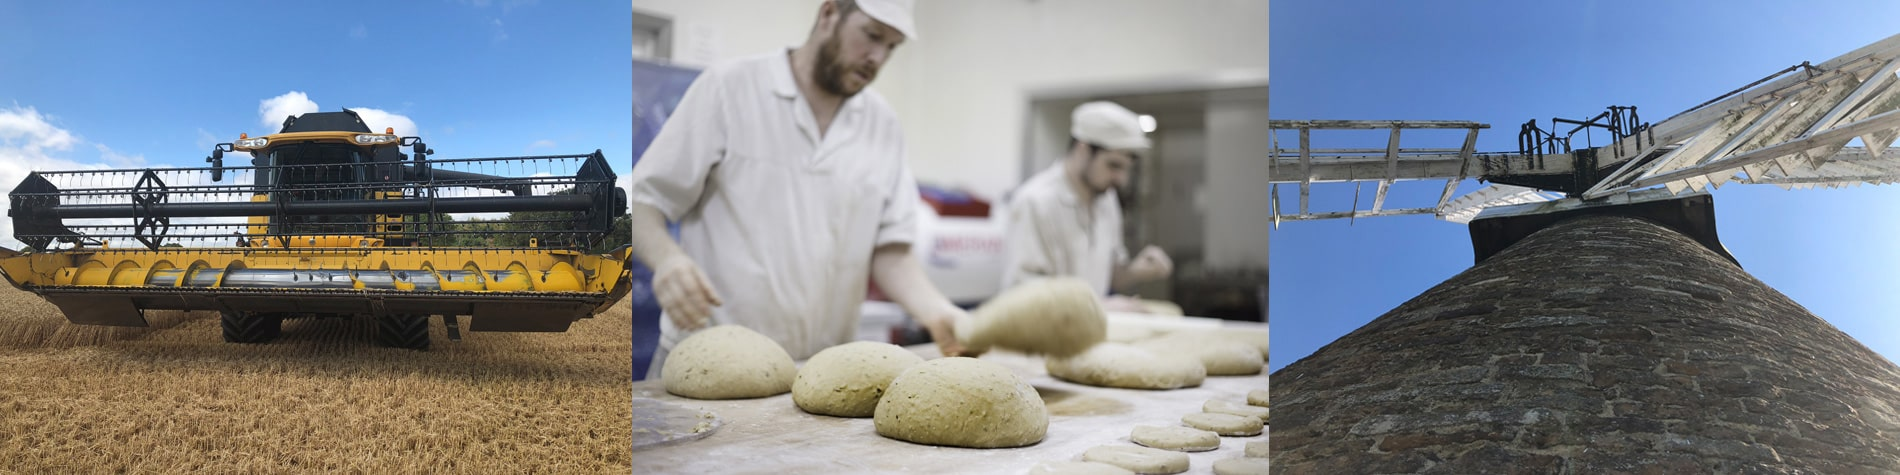 hambleton-bakery_science_healthy-loaves.jpg